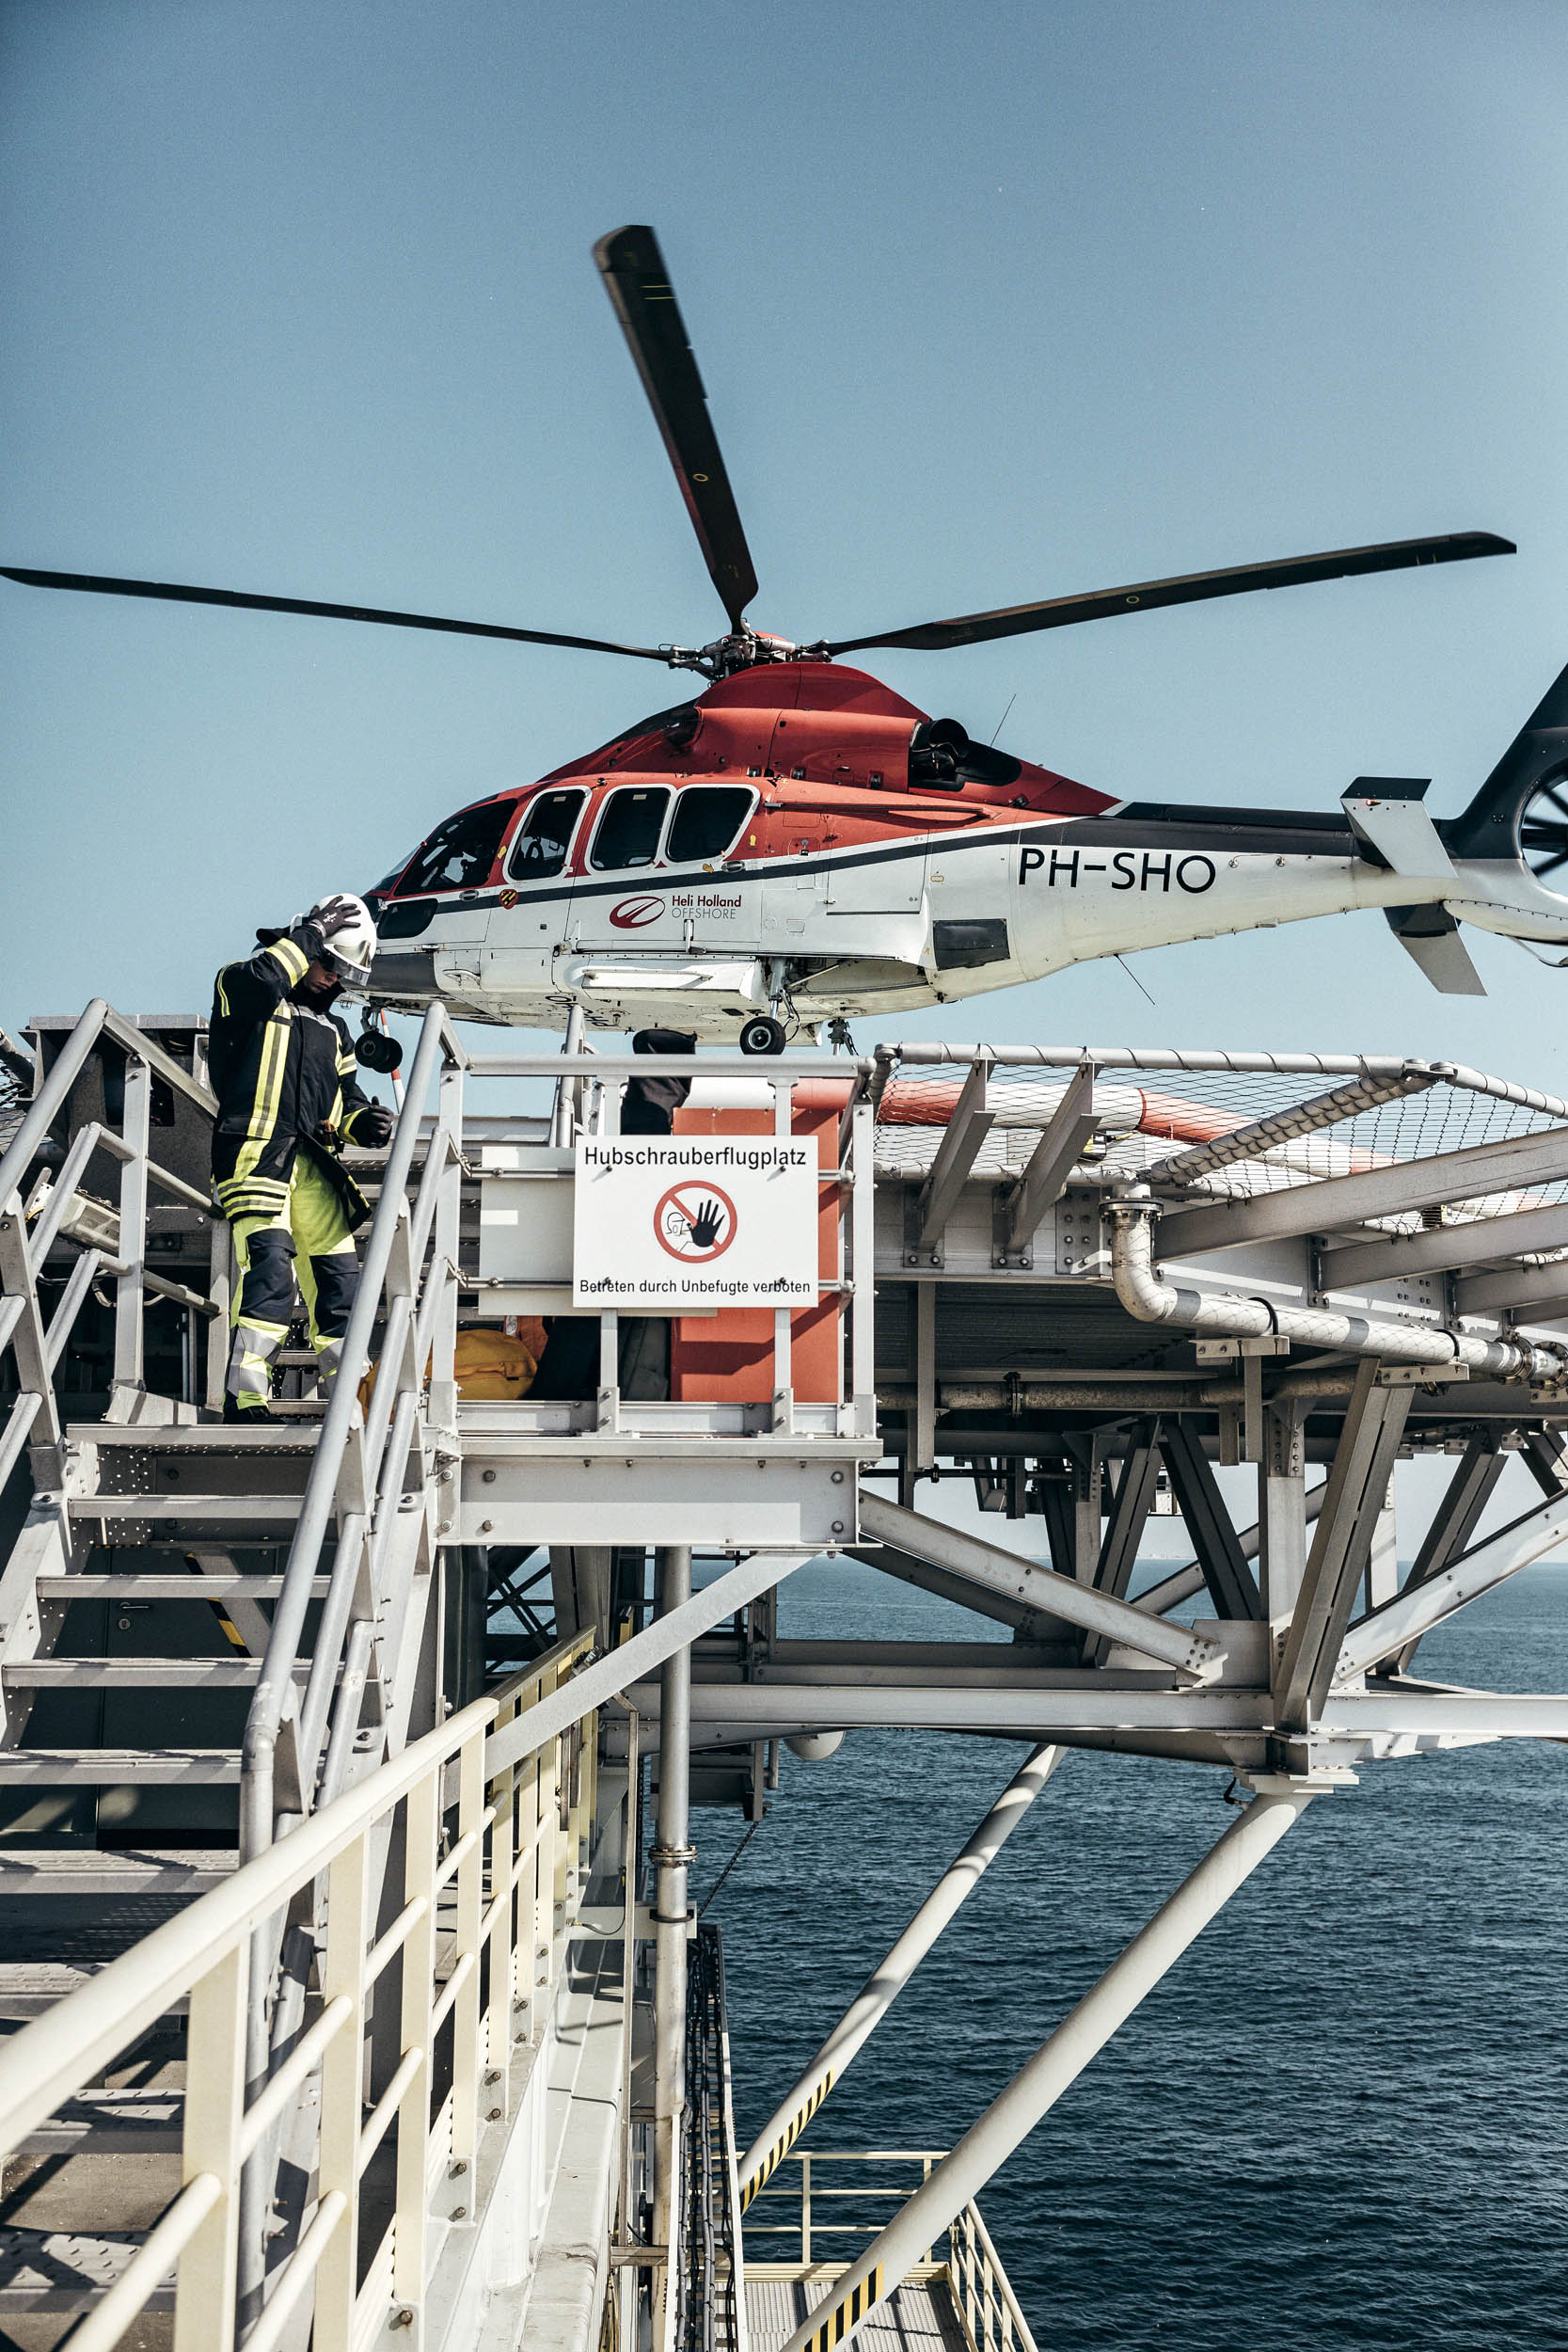 2019-SeifertUebler-EWE-offshore-windpower-032.jpg